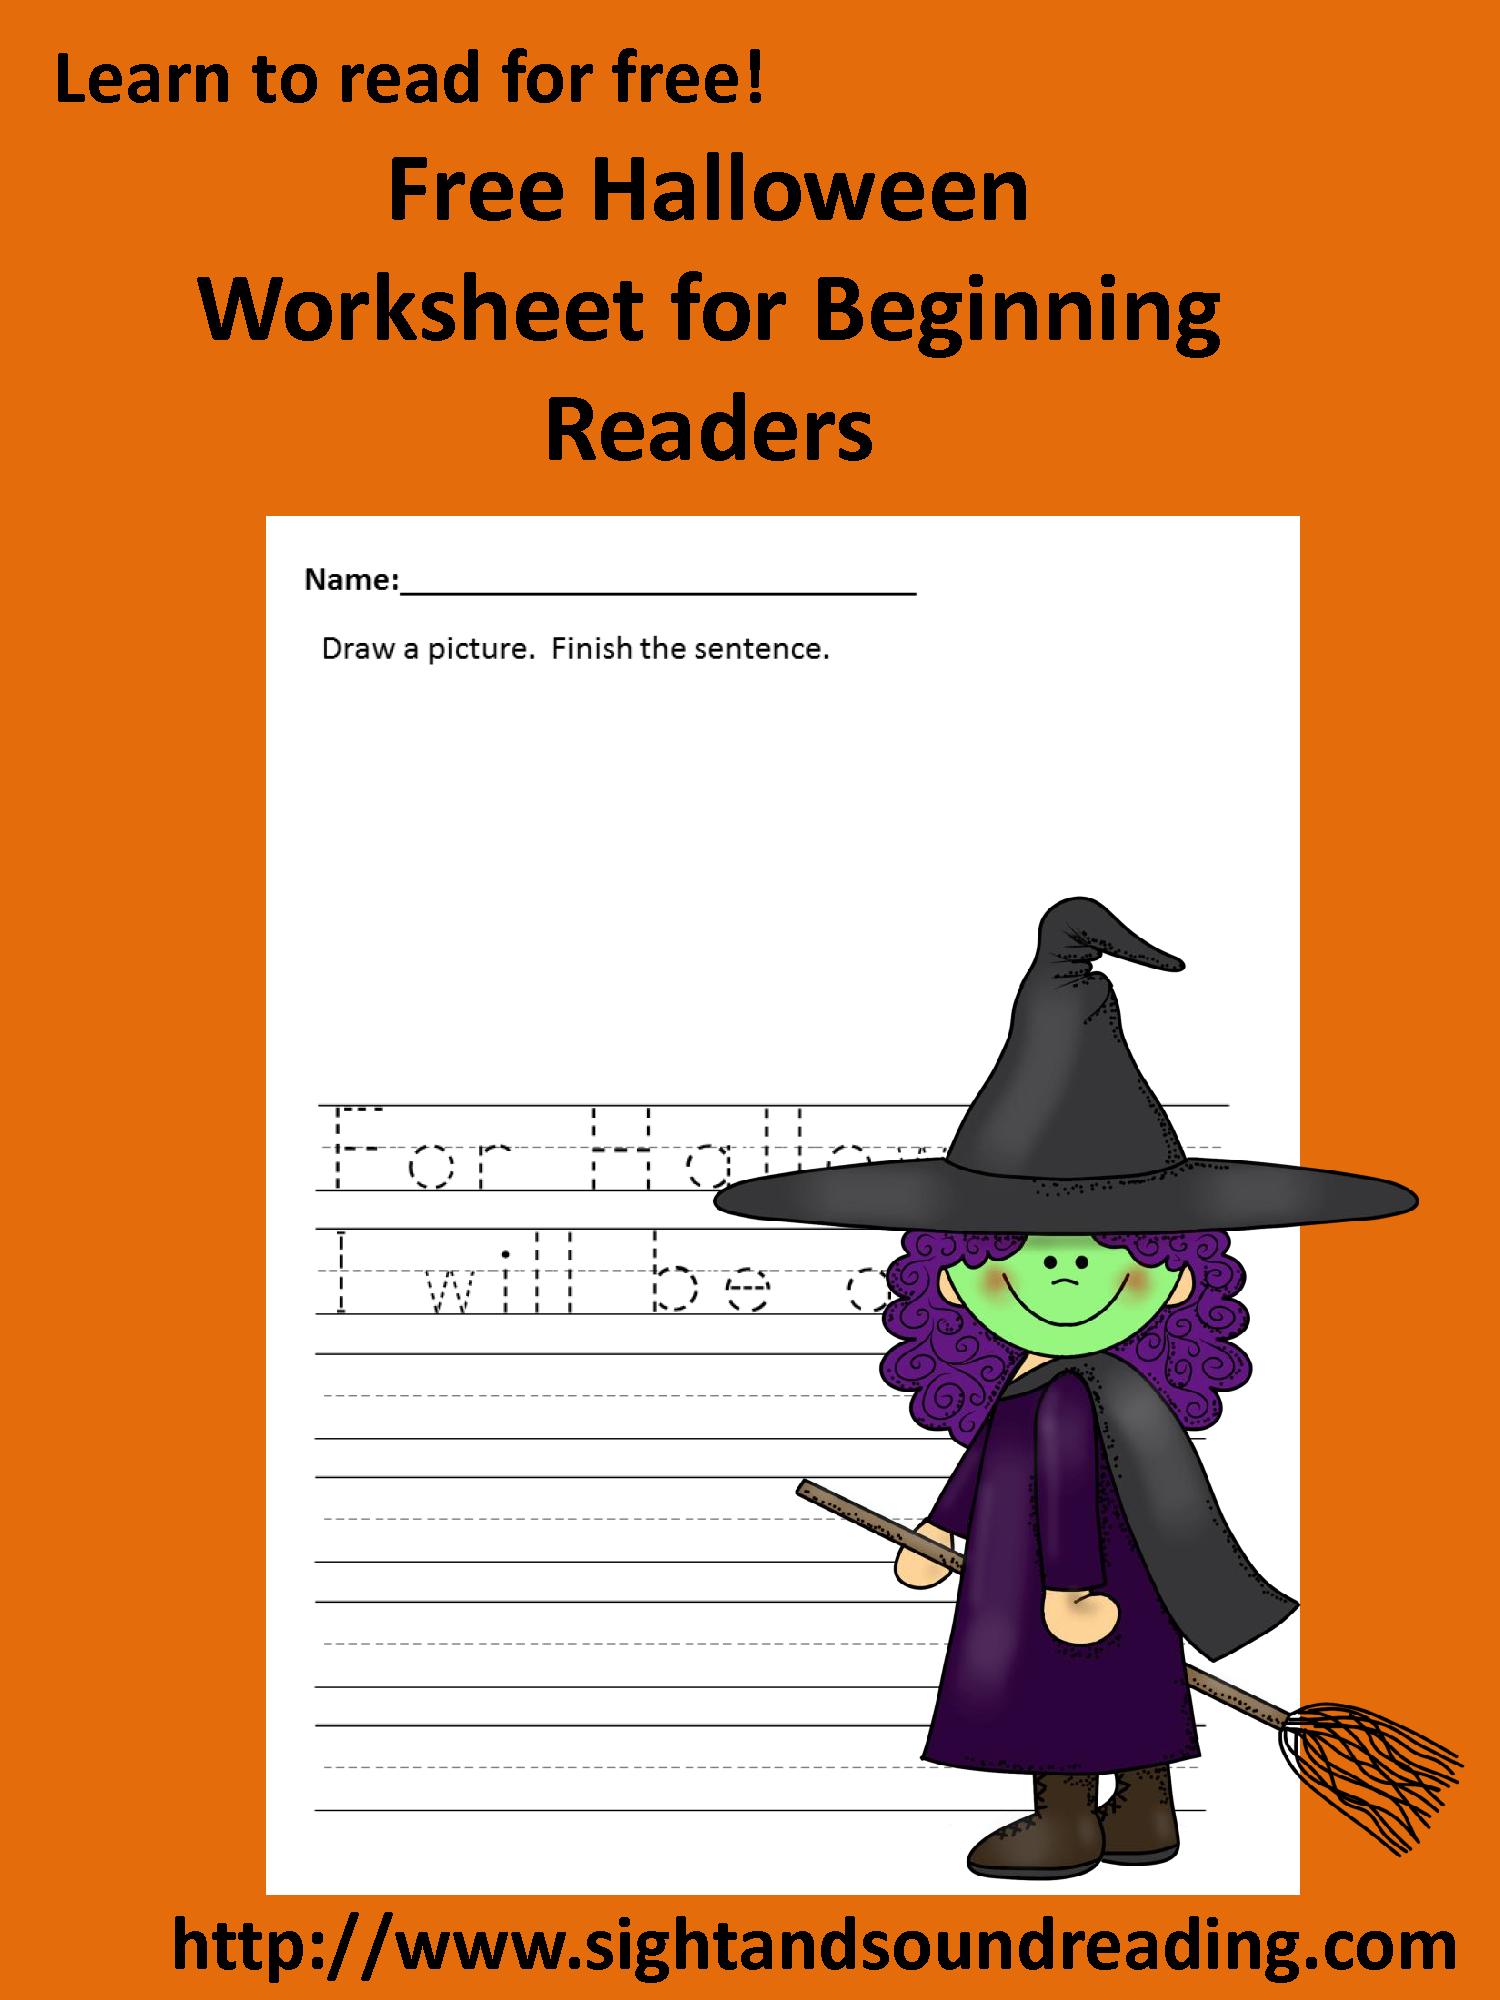 Halloween Writing Prompt For Kindergarten Or First Grade